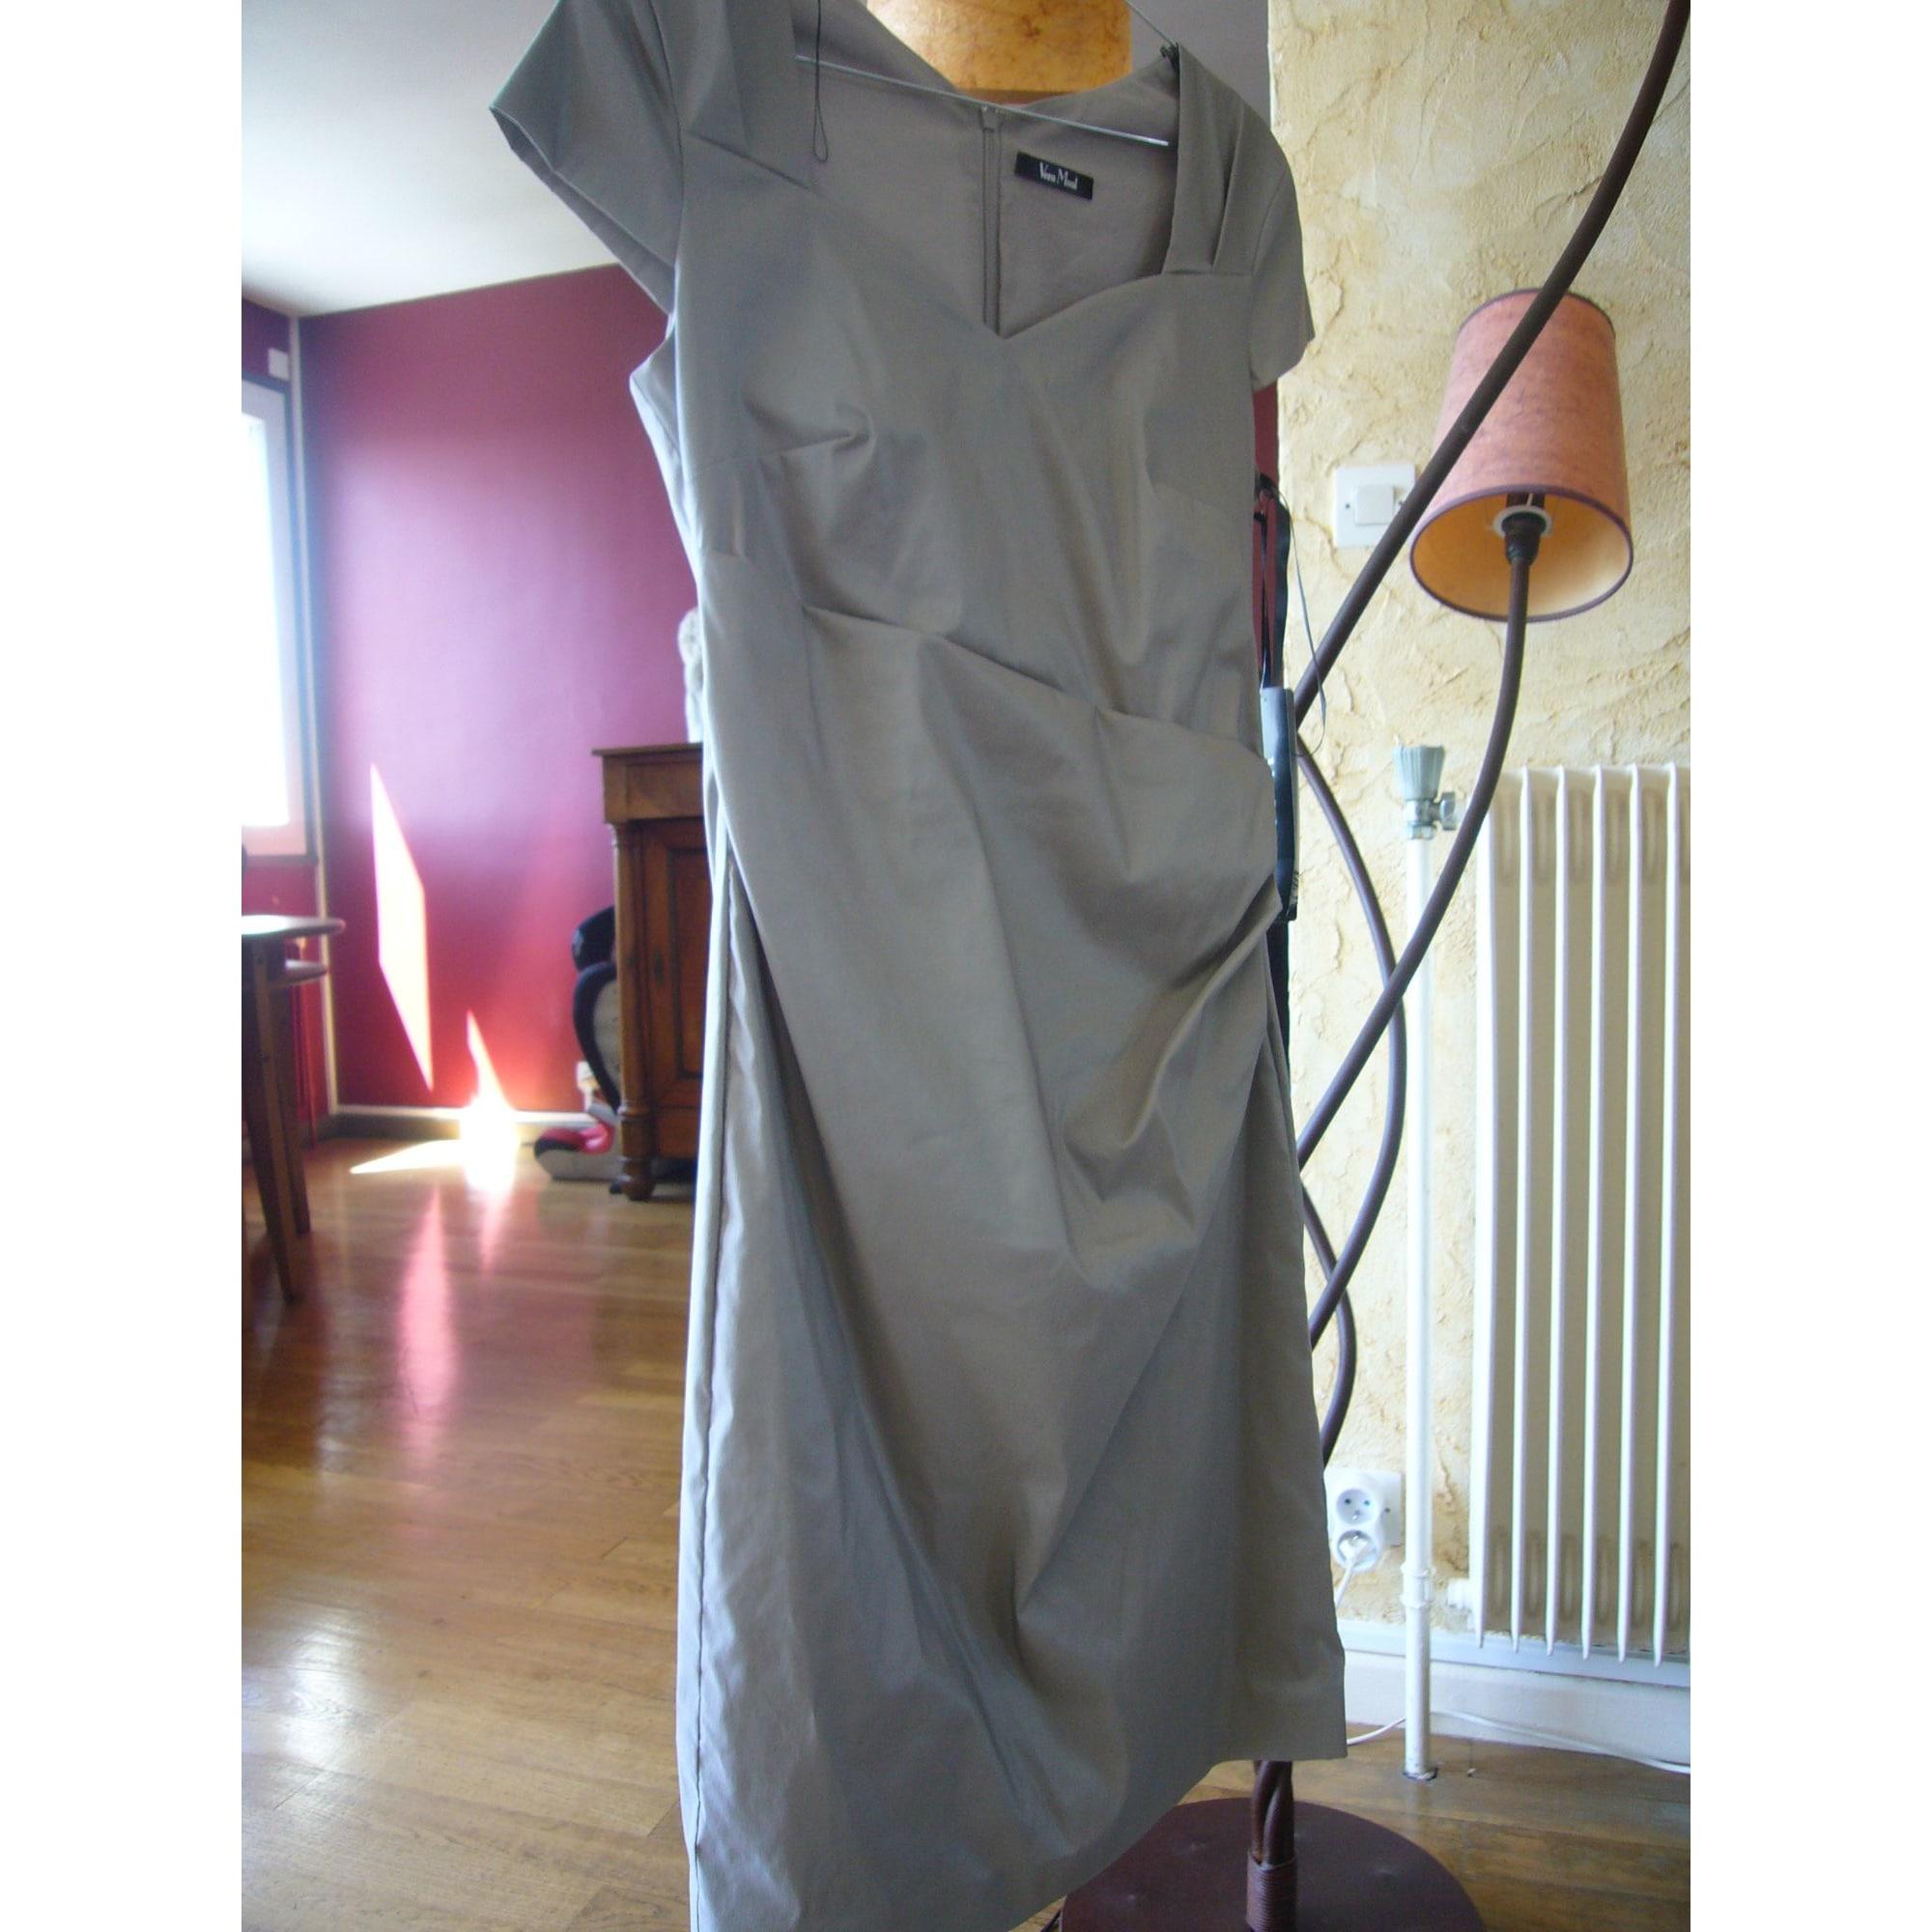 eb8ff945f58 Robe courte VERA MONT 38 (M